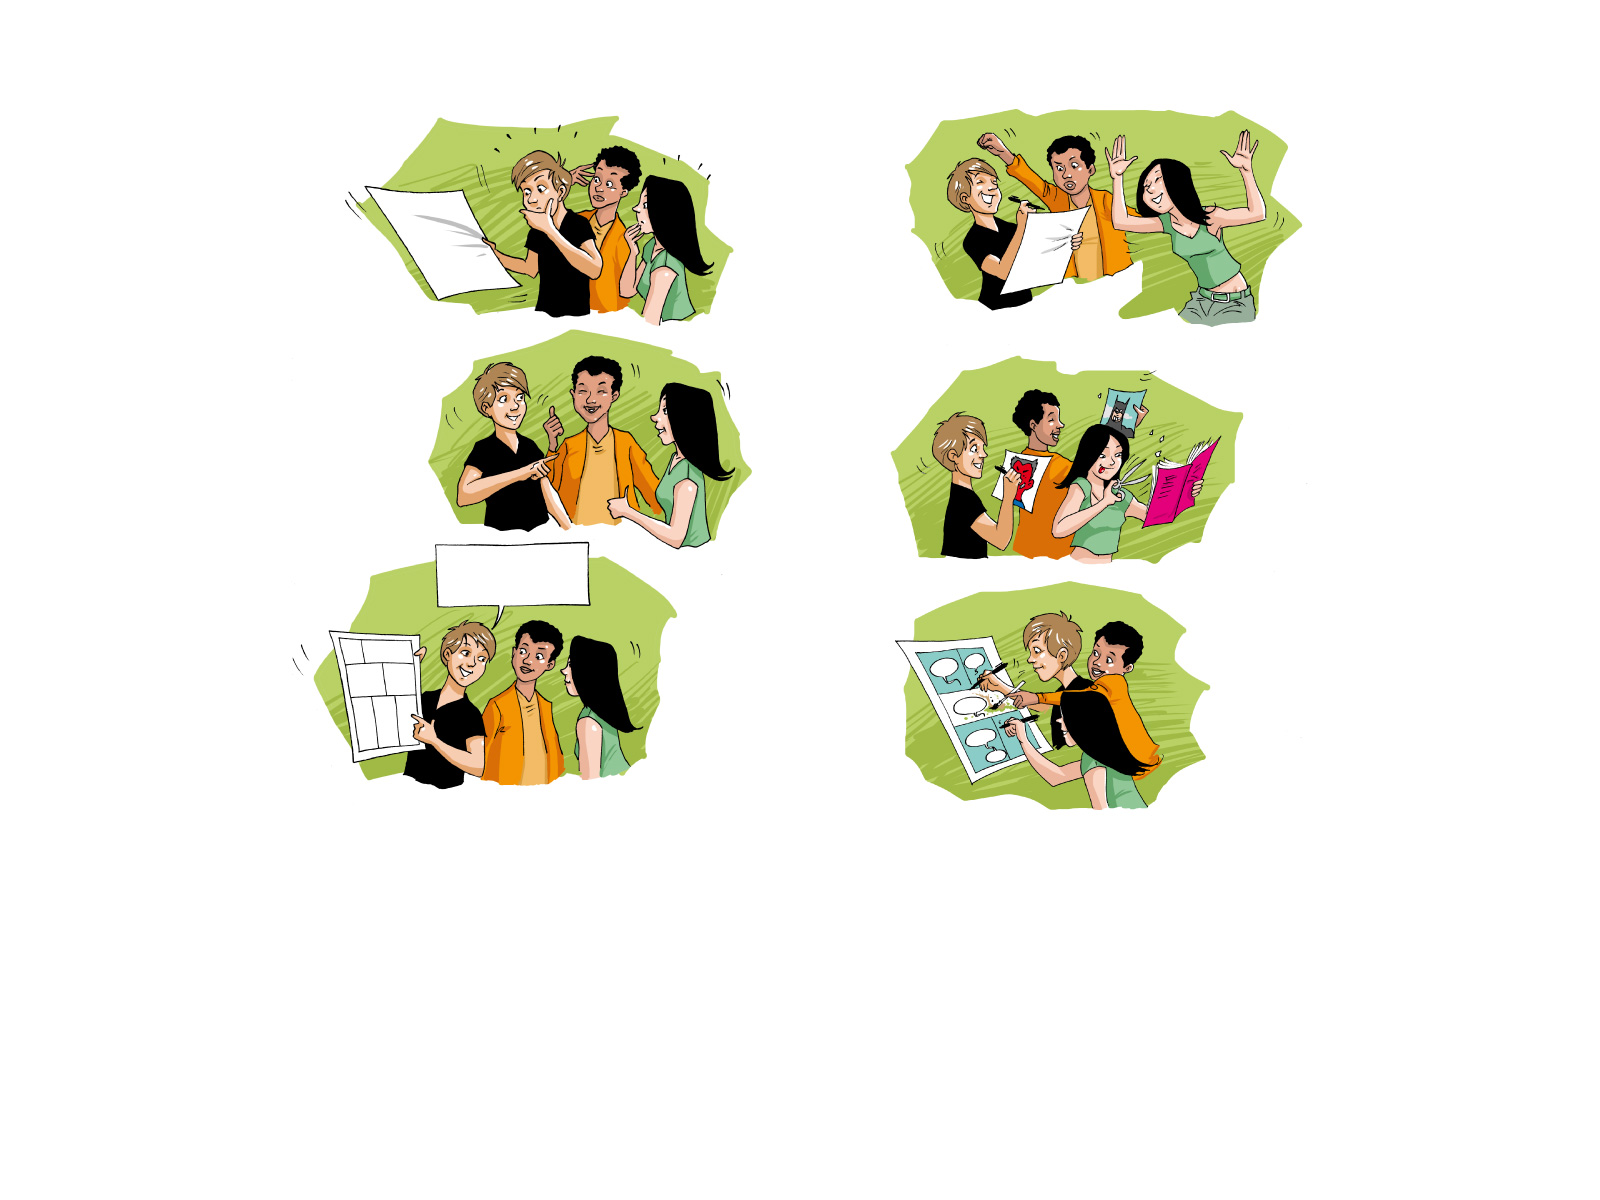 LEDISCOTOlivier-Illustrations-EDITIONS-3624